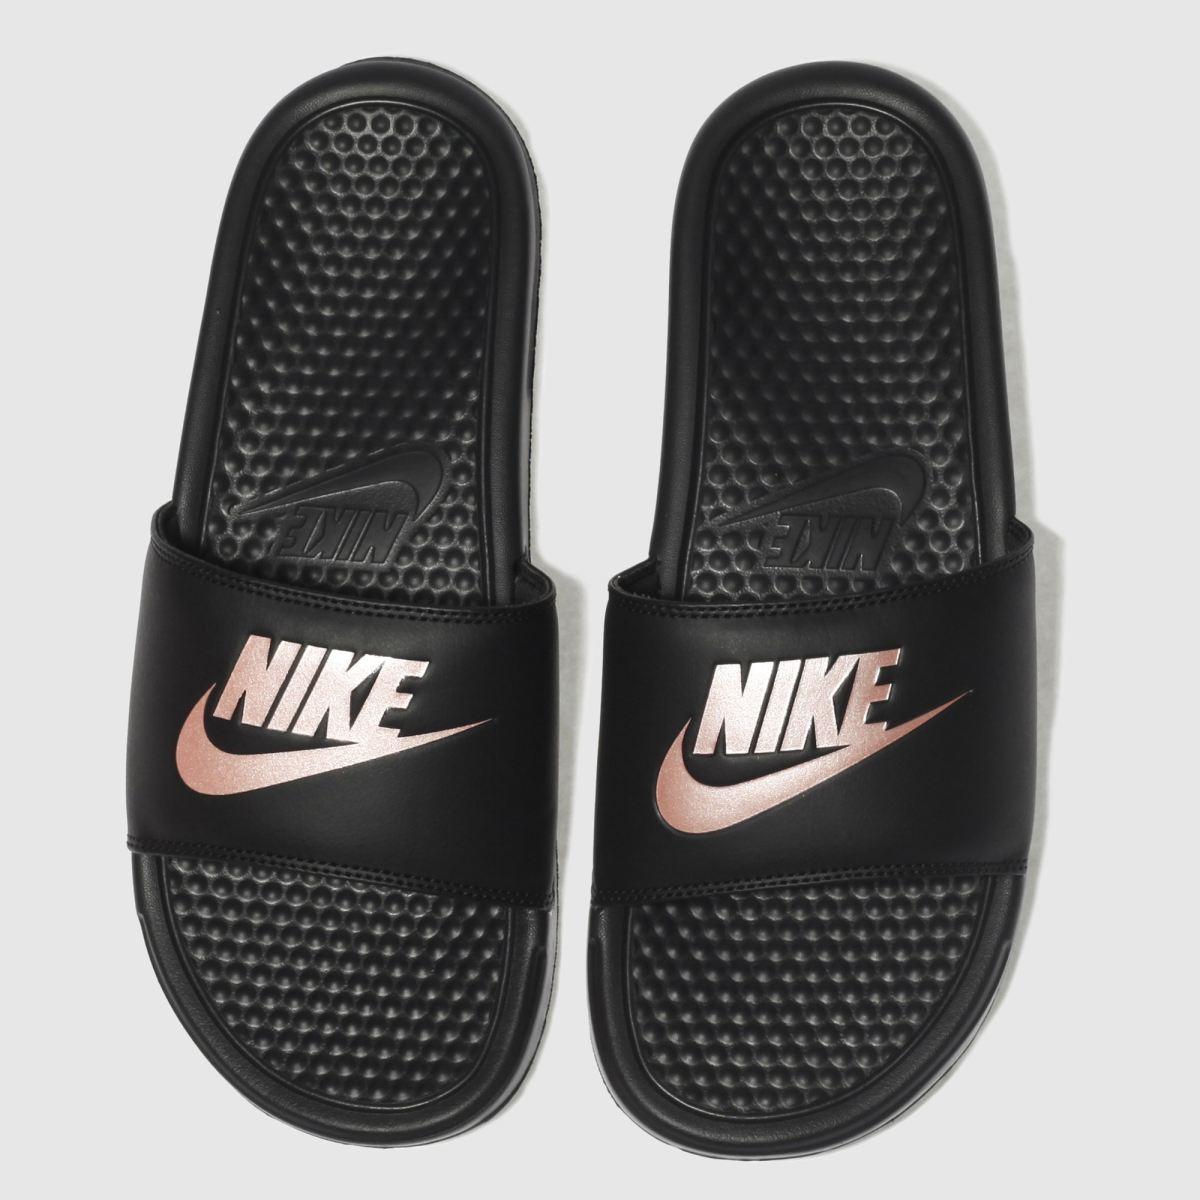 Nike Black & Gold Just Do It Sandal Sandals